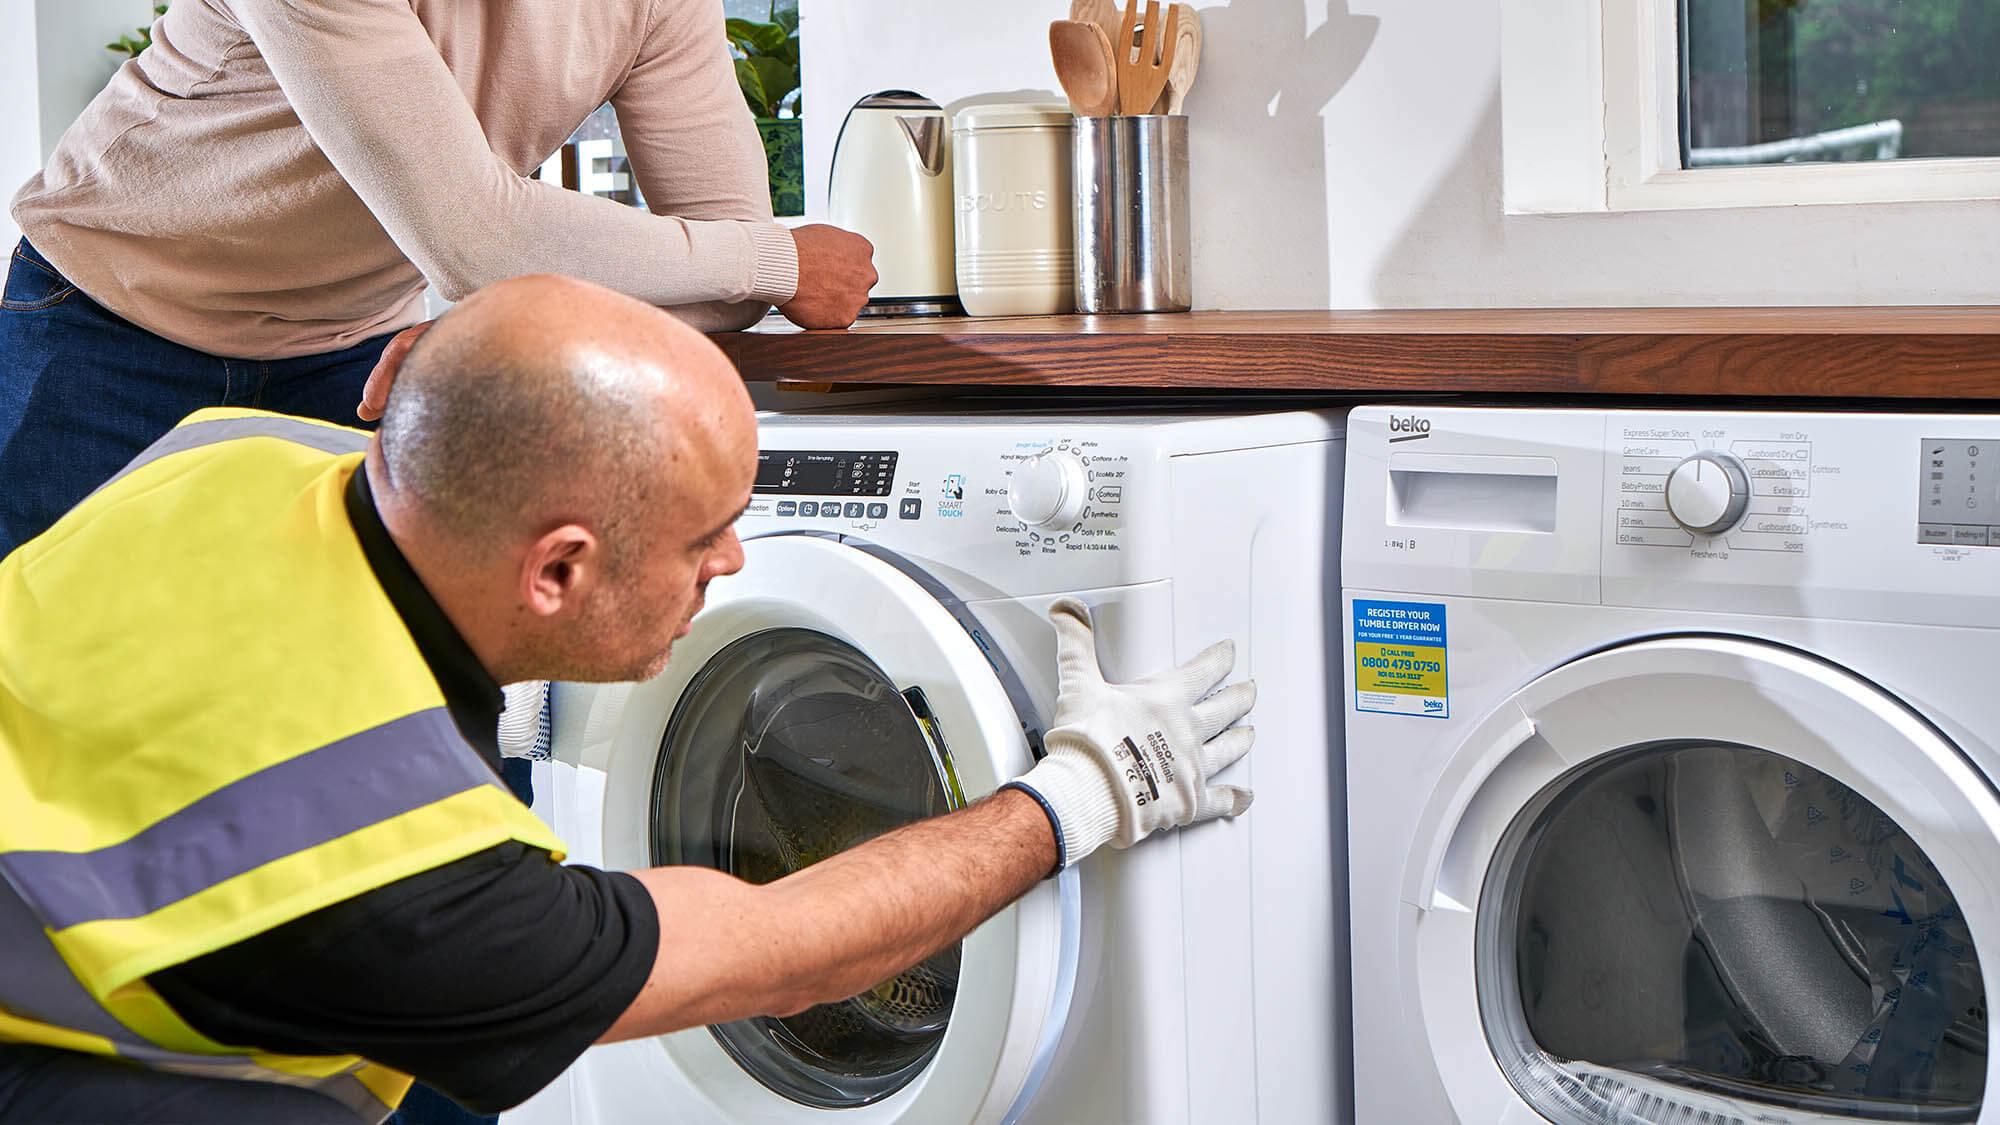 AO Repair & Care | Appliance repair and protection service | ao.com